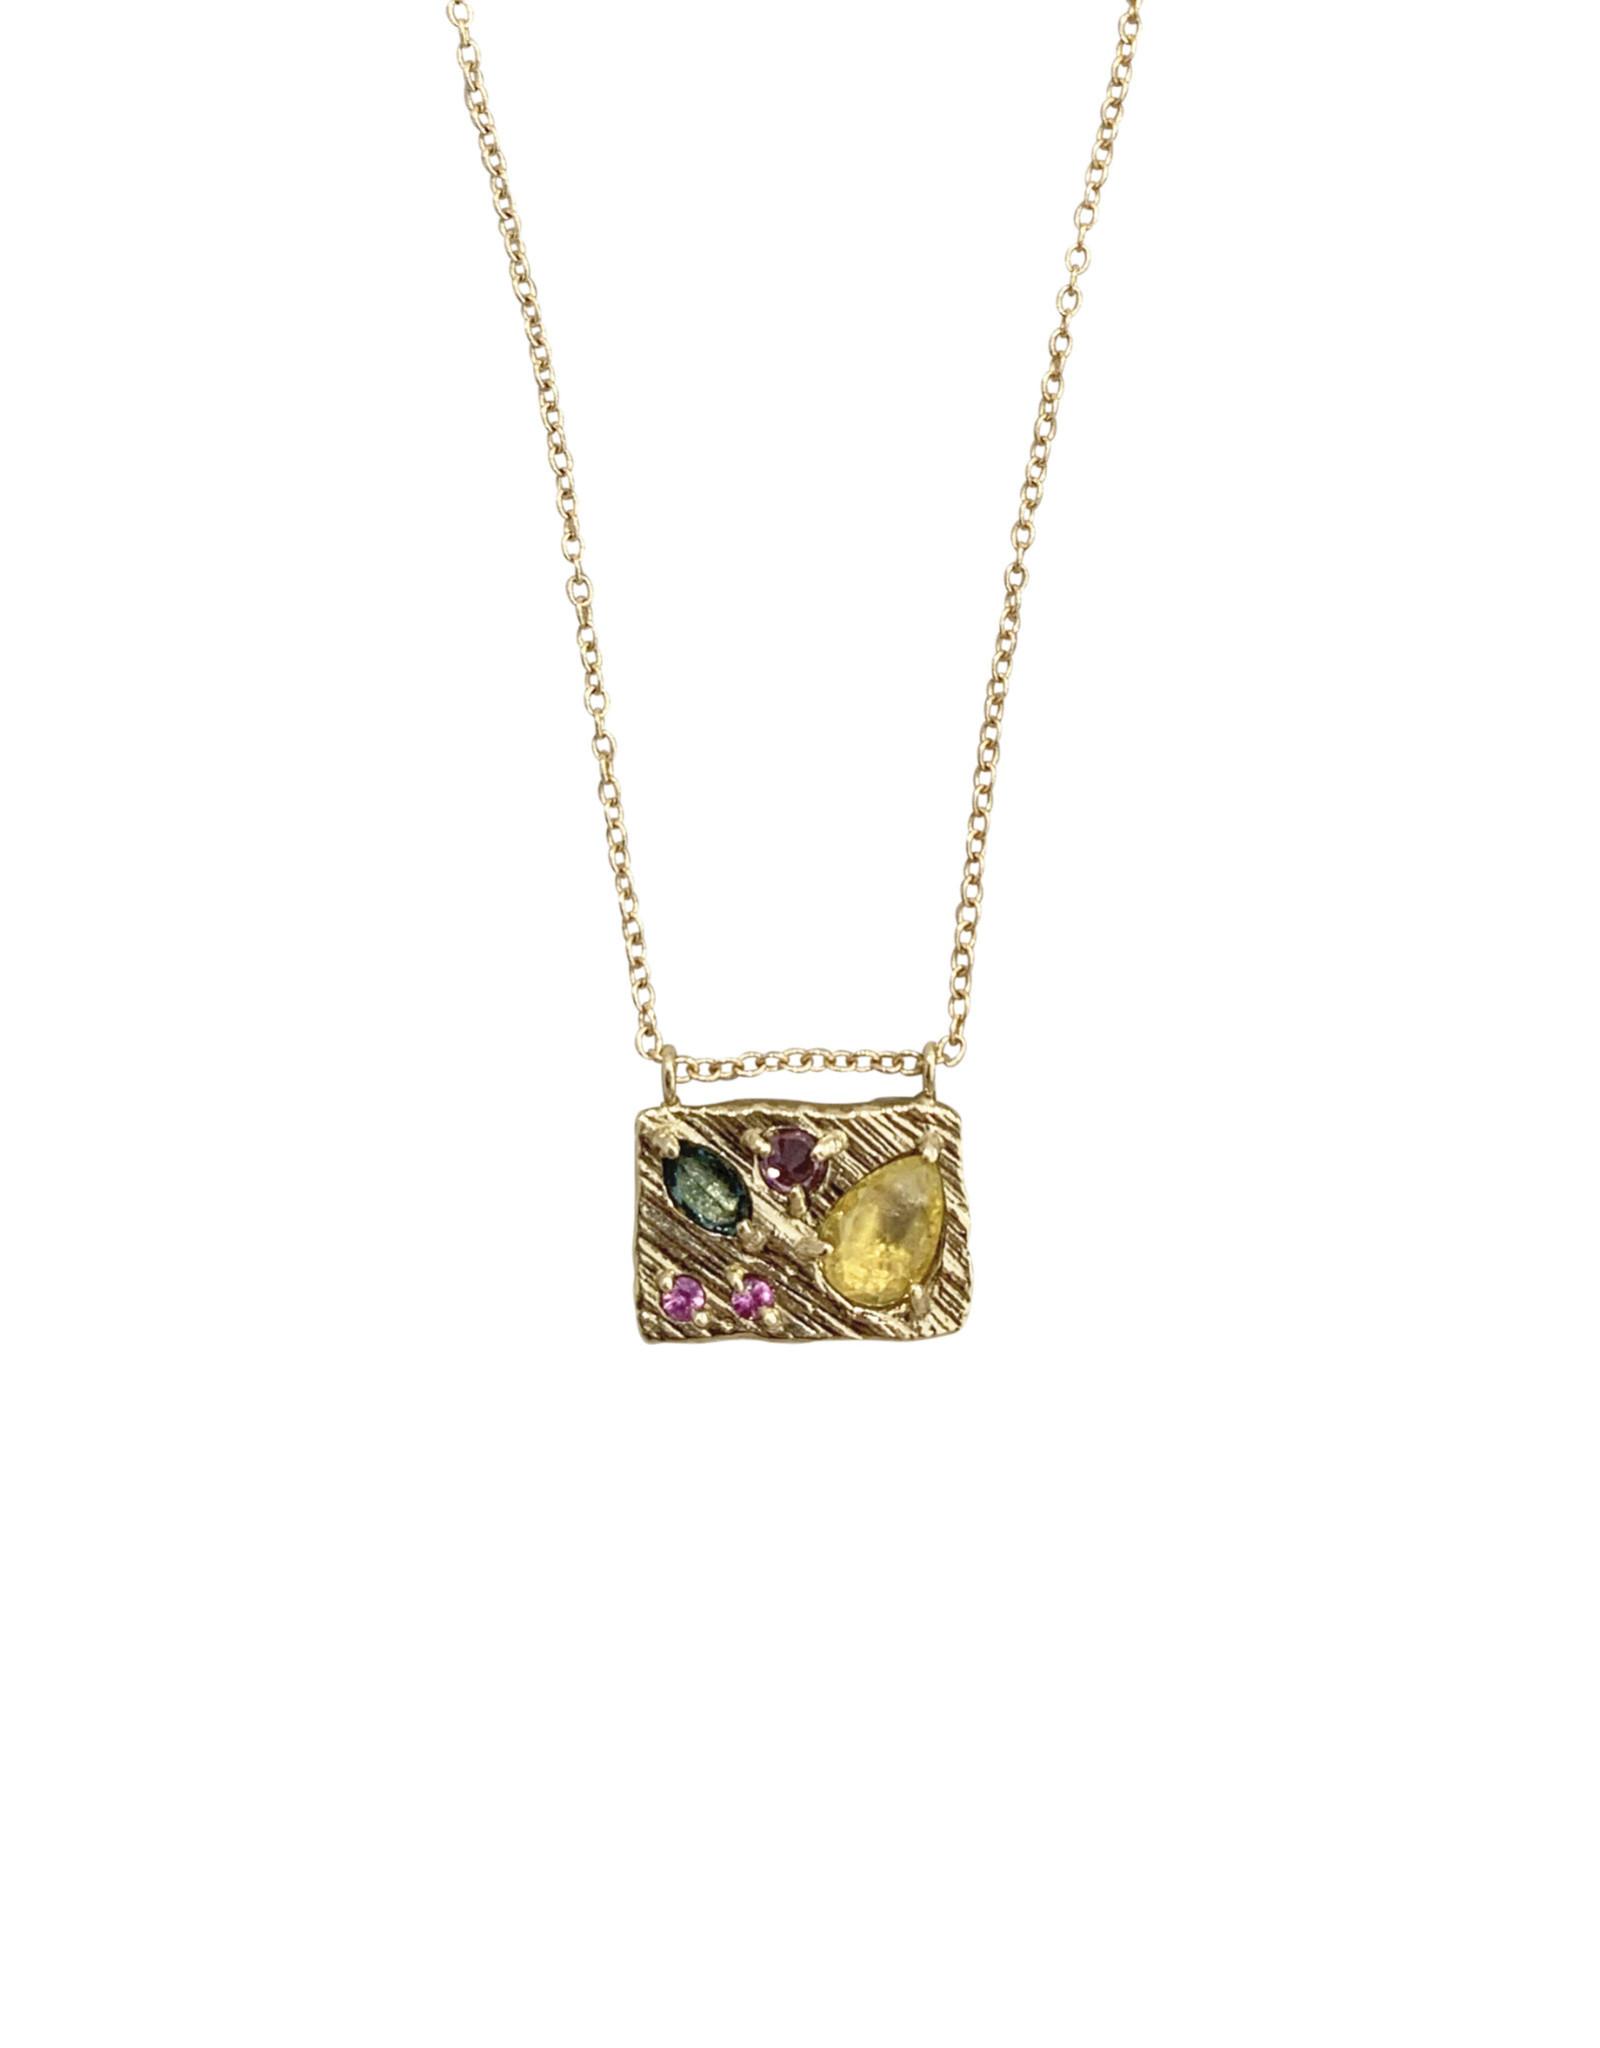 Lio & Linn Tropical Collage Necklace